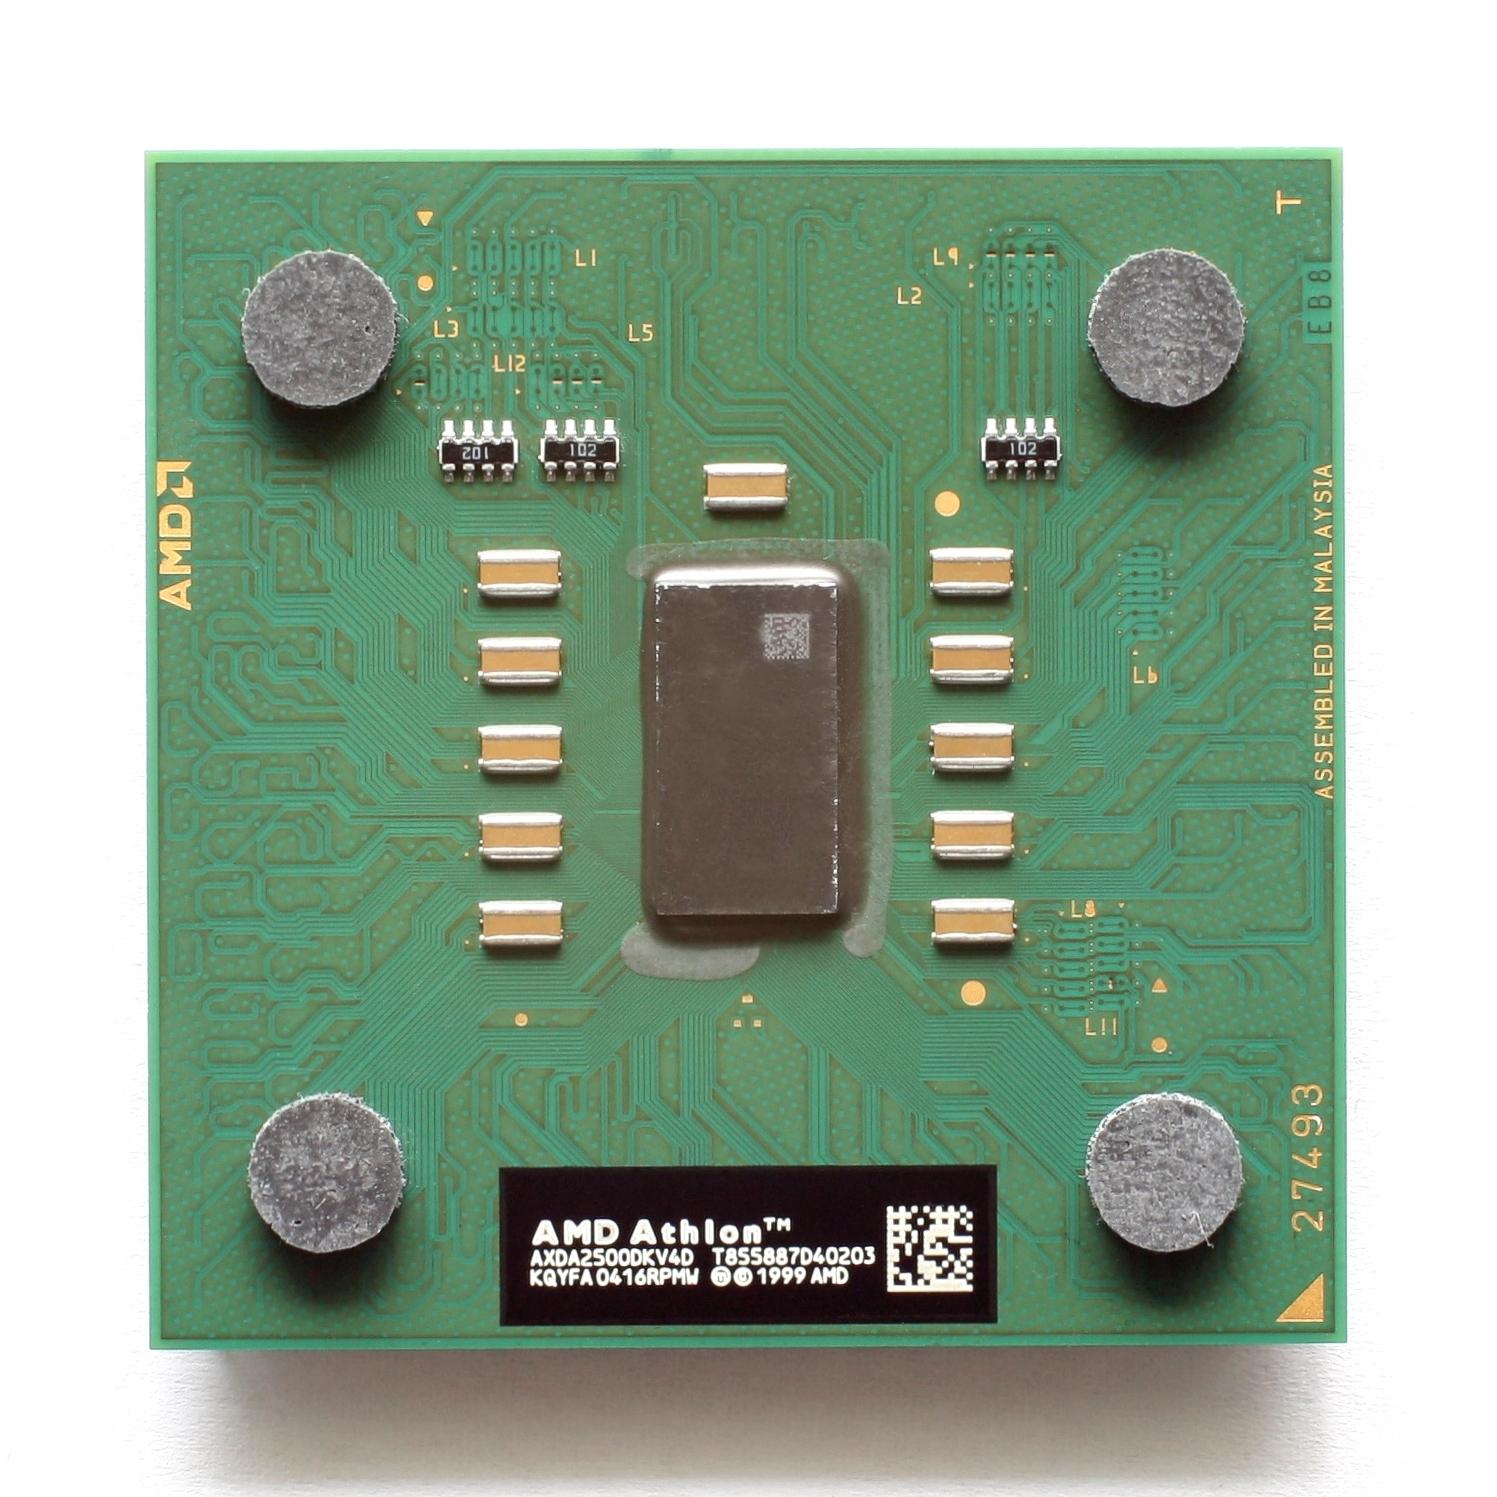 AMD Athlon(tm) 64 Processor - driver software FOUND